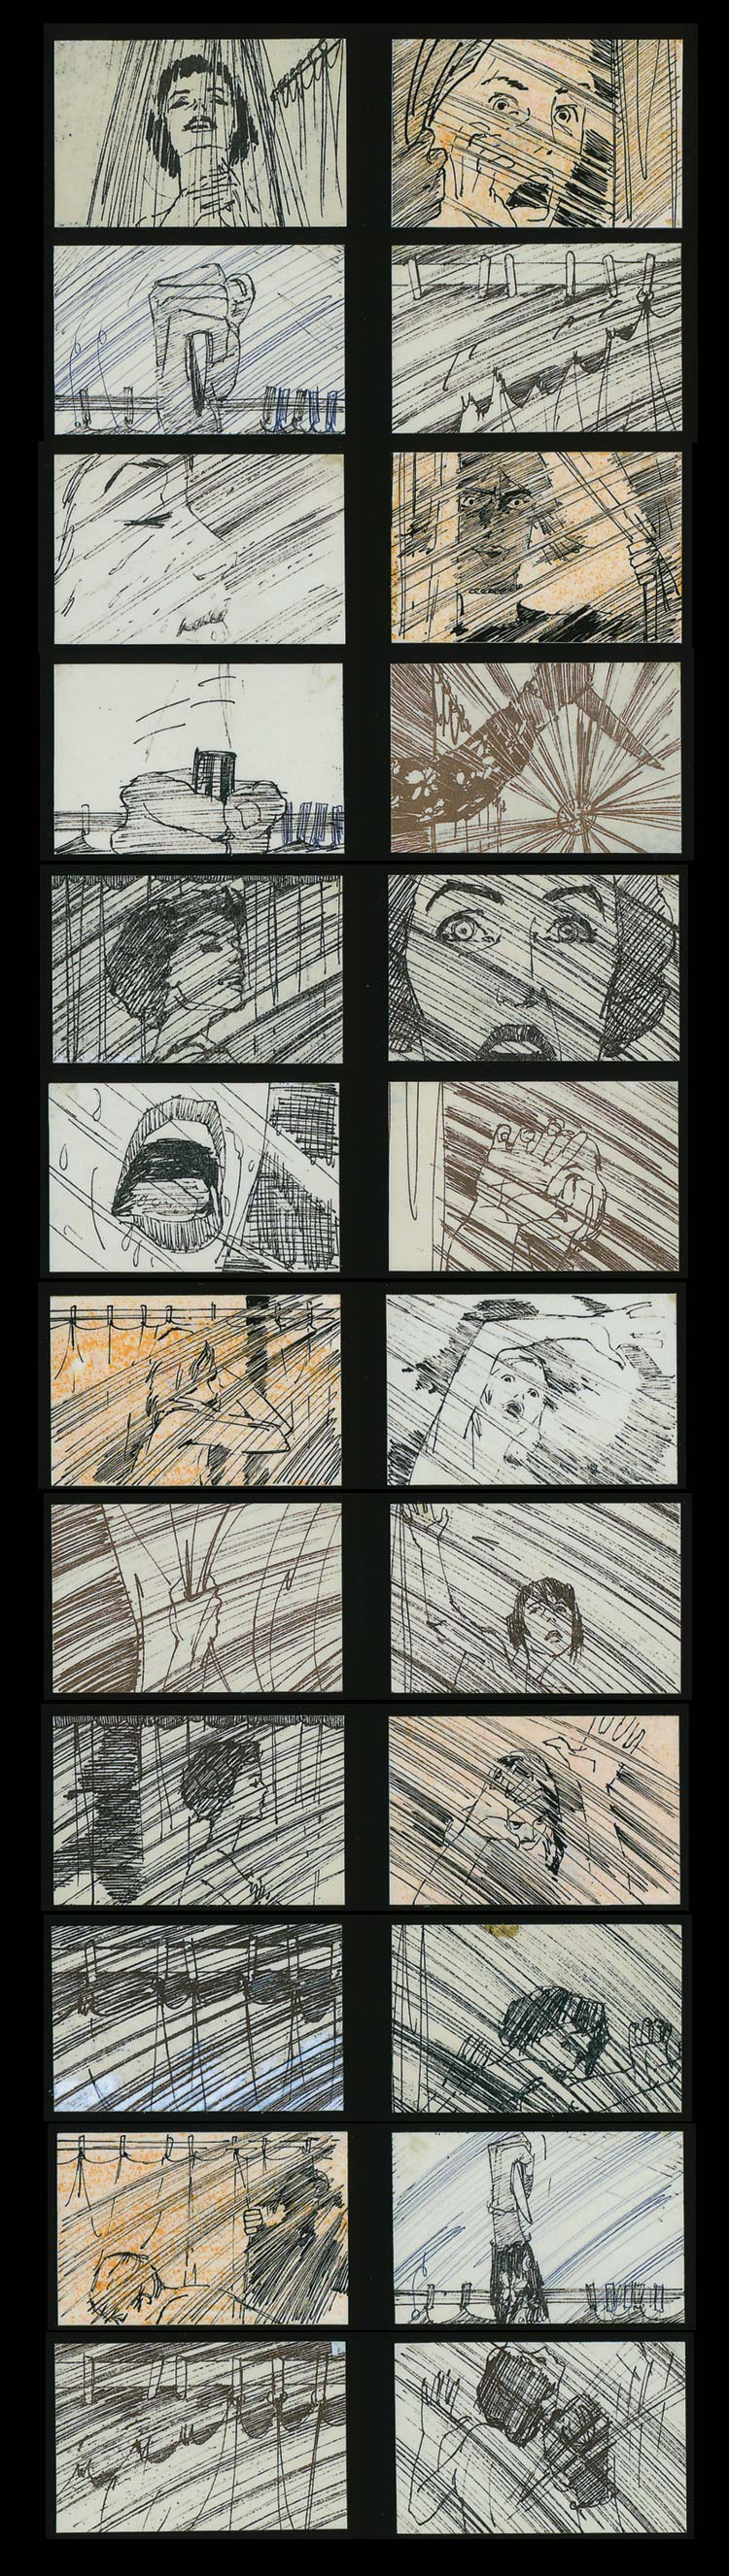 psycho storyboard Storyboards from Ten Popular Films